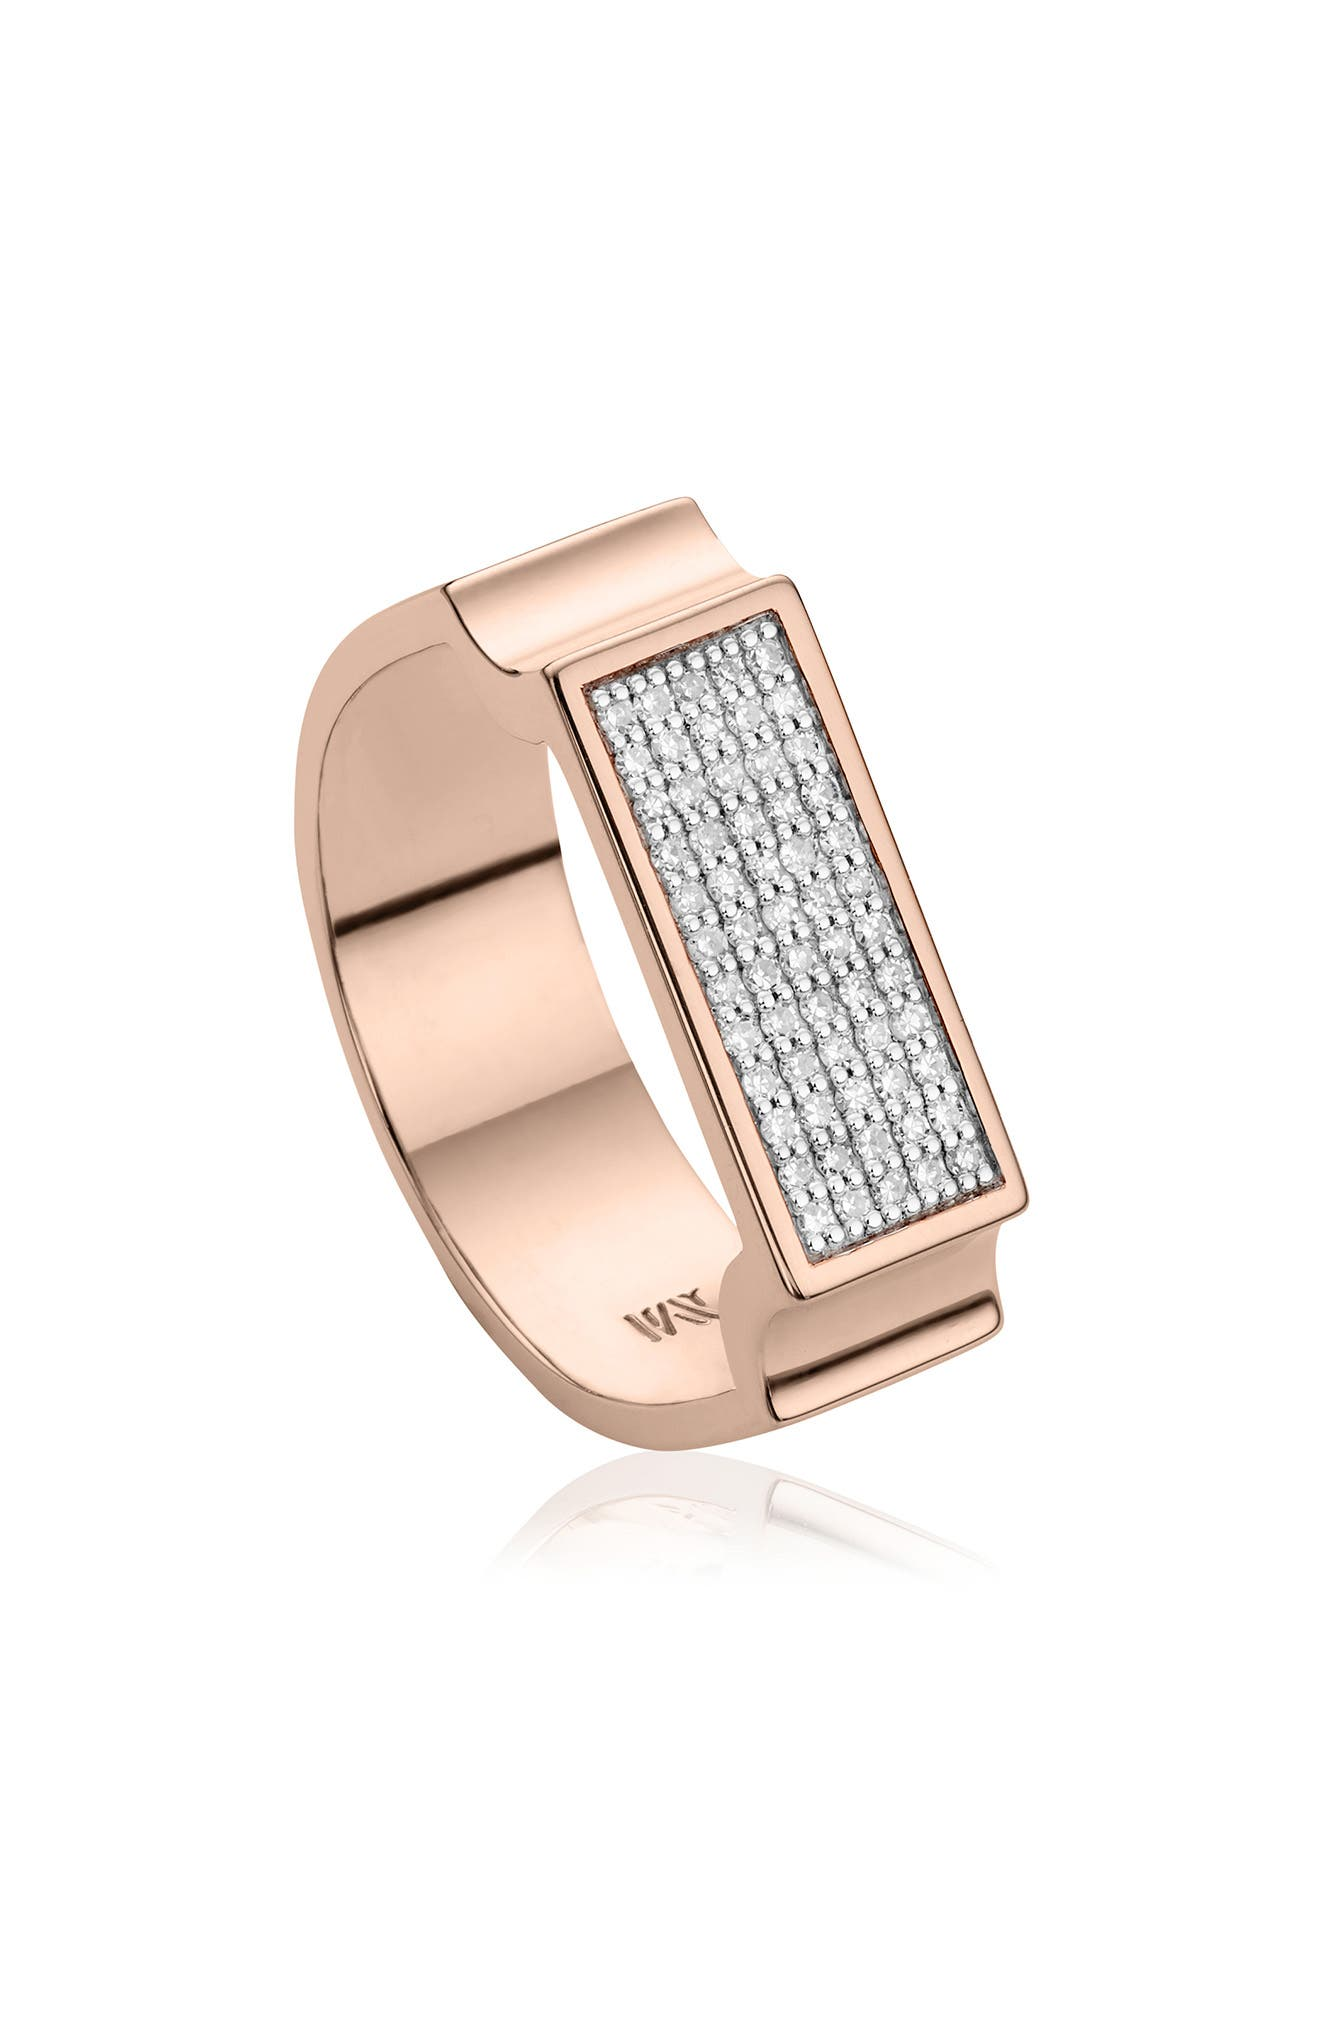 Diamond Signature Wide Ring,                             Main thumbnail 1, color,                             ROSE GOLD/ DIAMOND